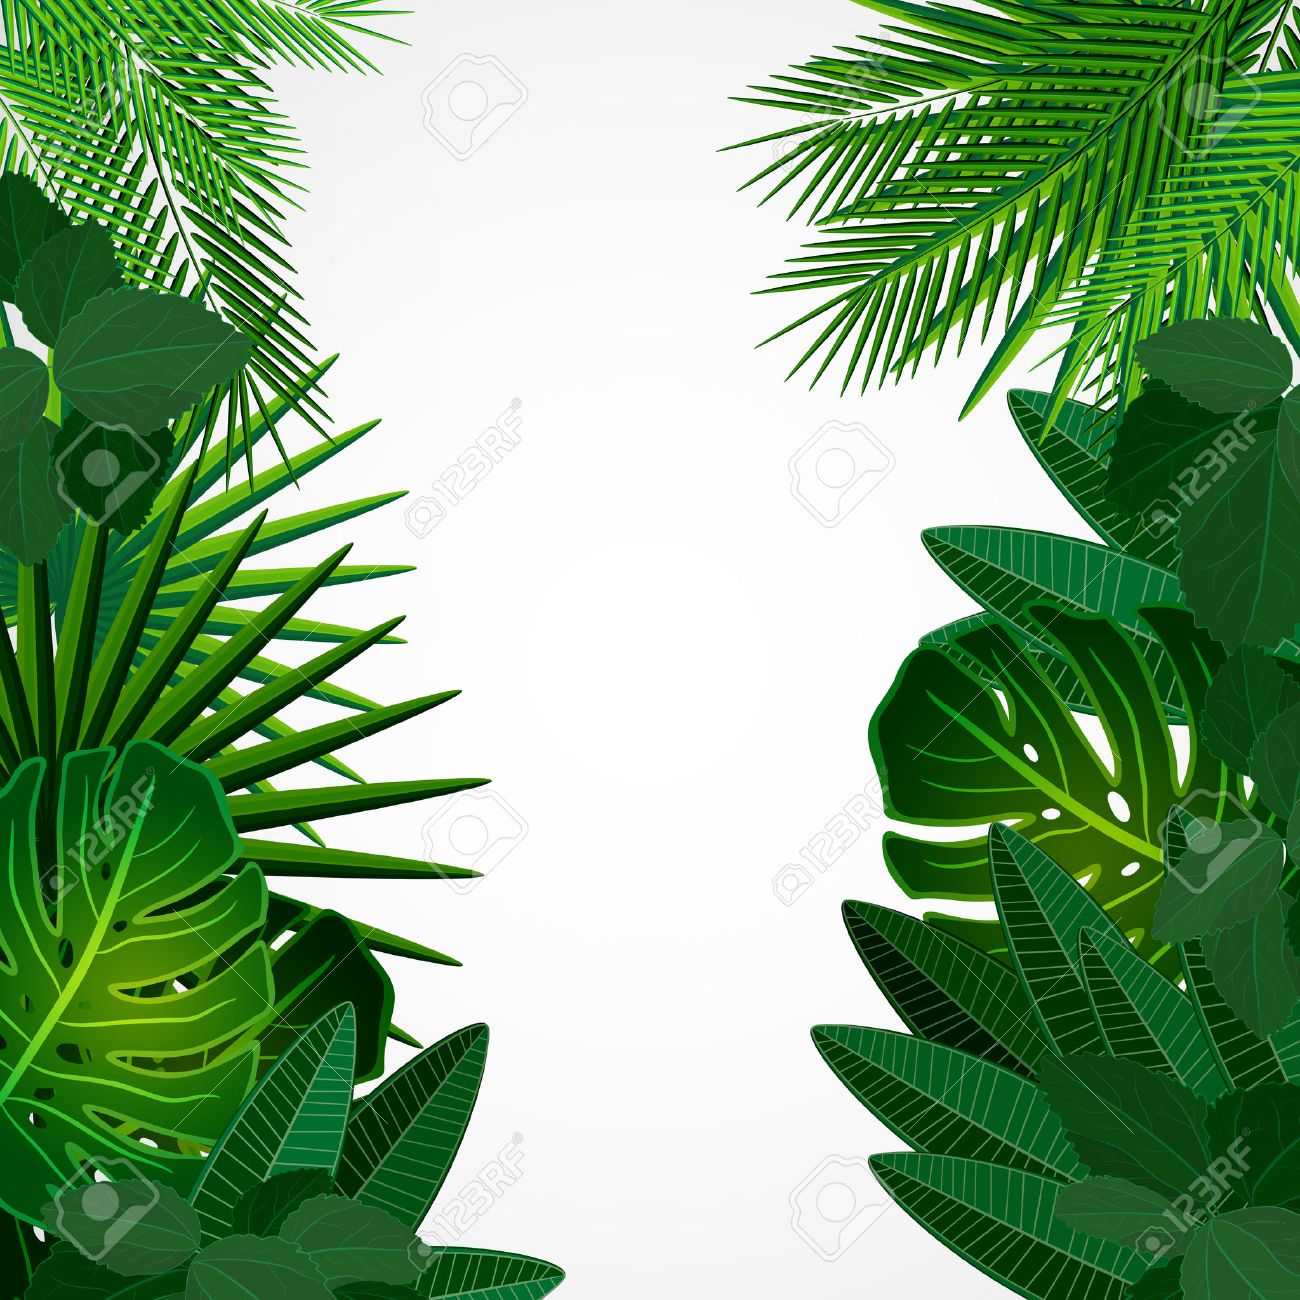 Tropical leaves. Floral design background. - 33511453